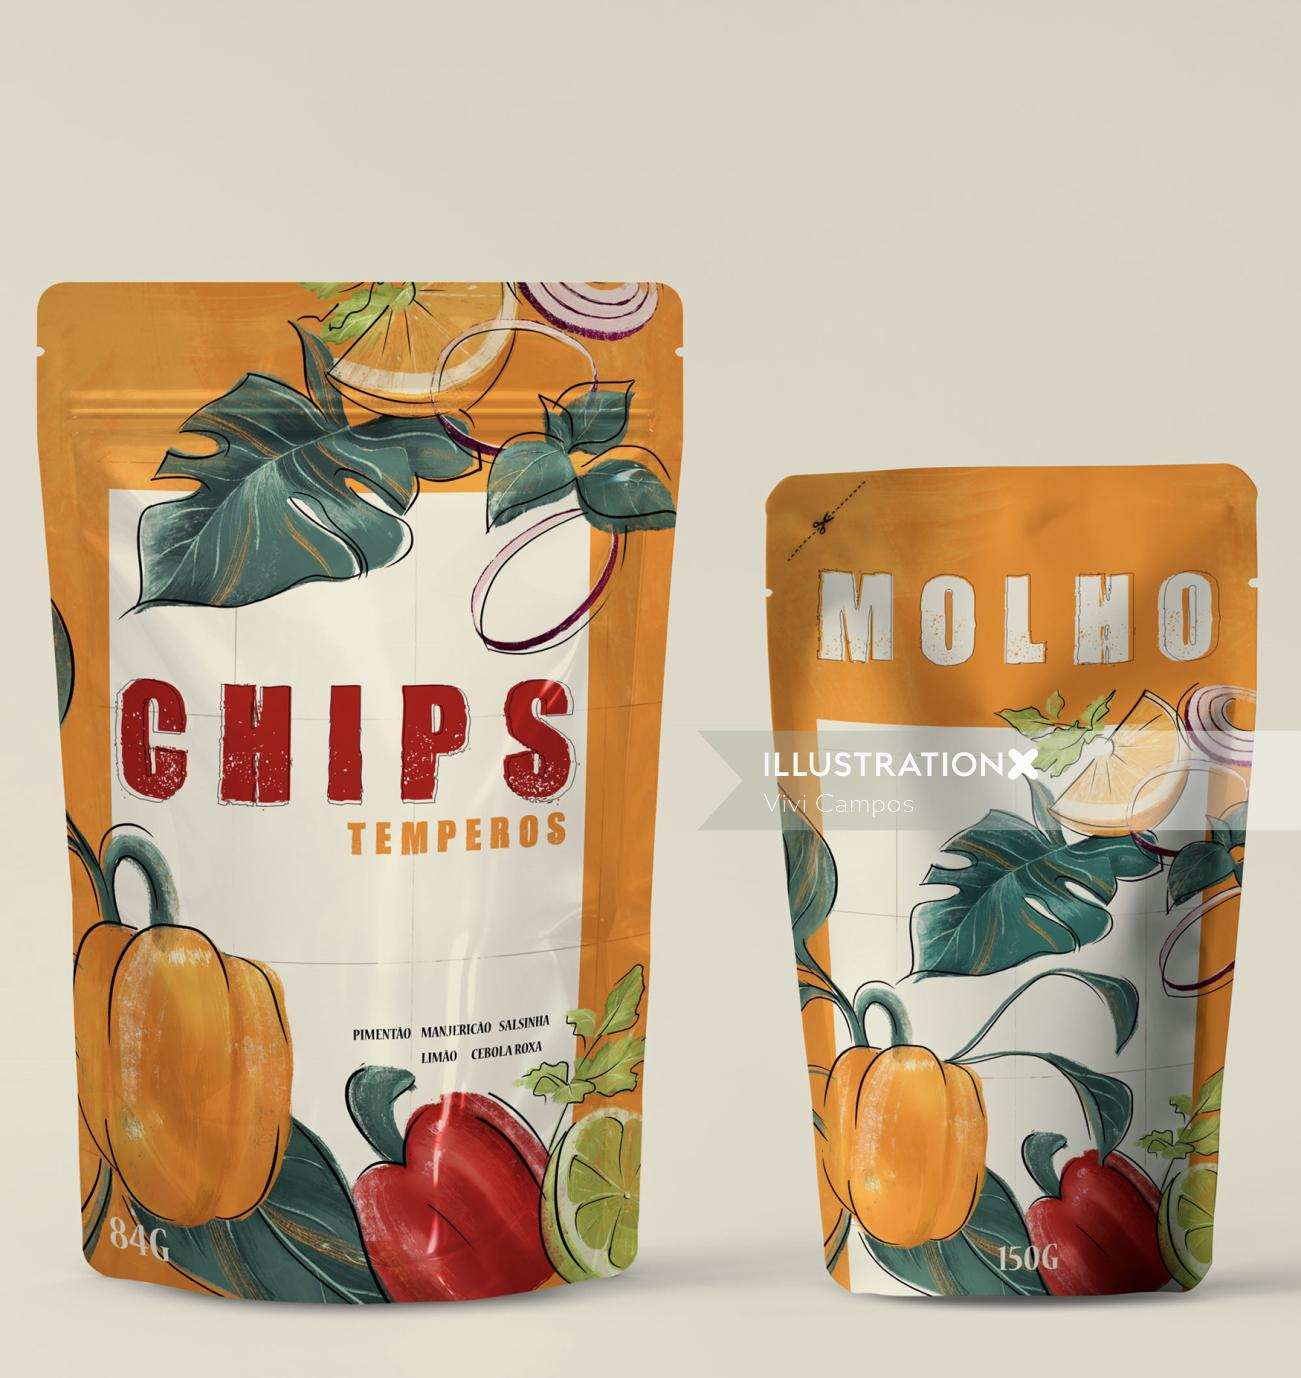 Advertising chips temperos